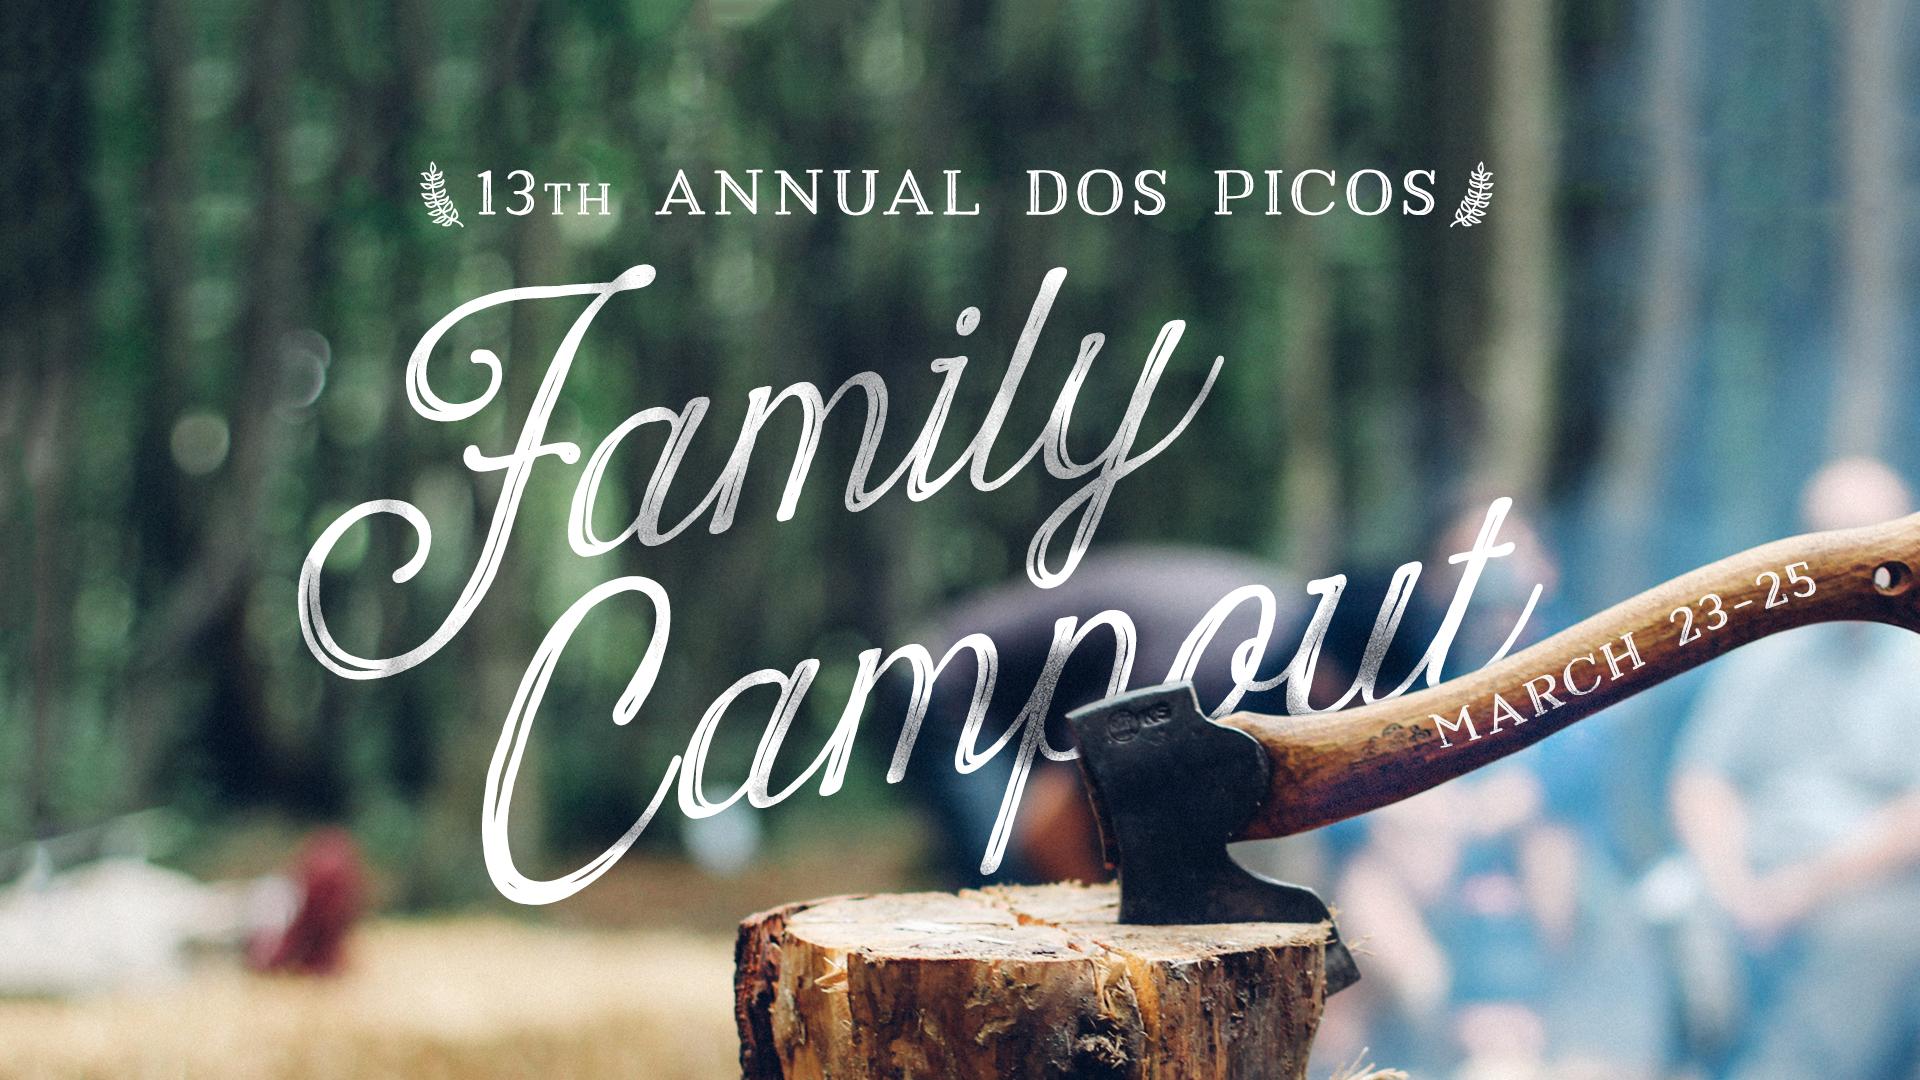 Family campout slide